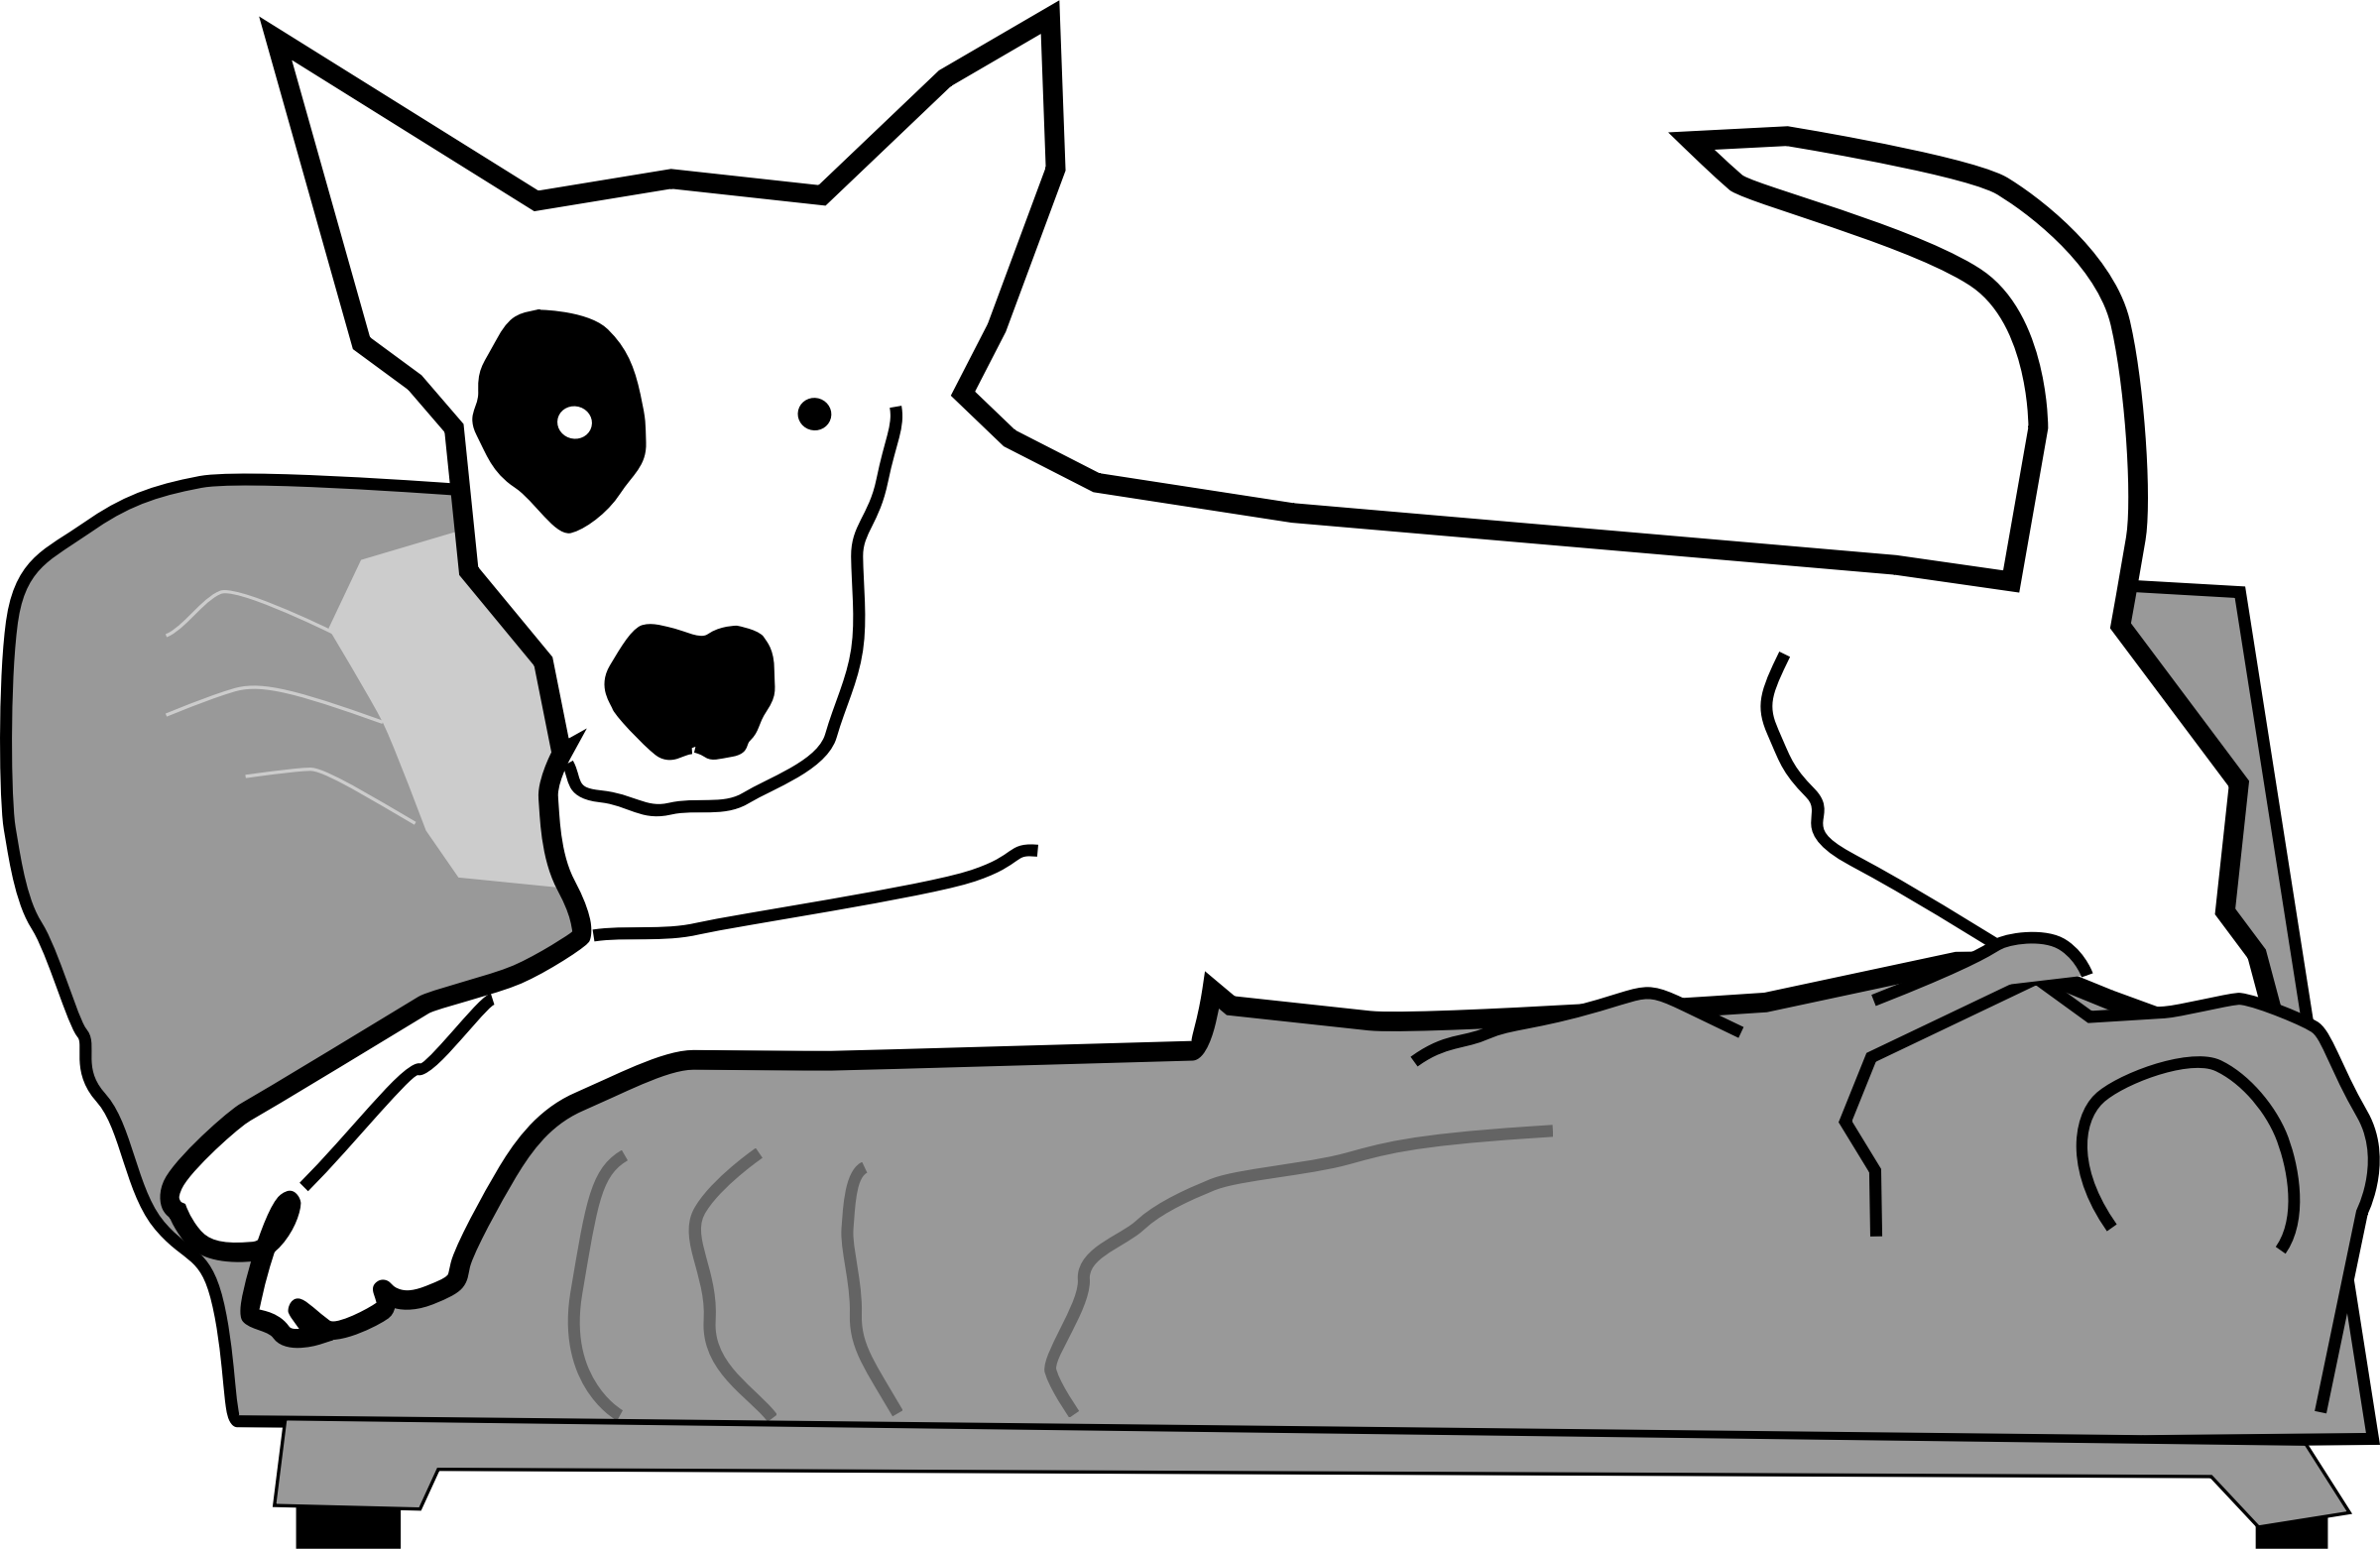 Terrier dog clipart freeuse library Clipart - Bullterrier head, bujung,Bull terrier cartoon,dog Bullterrier freeuse library